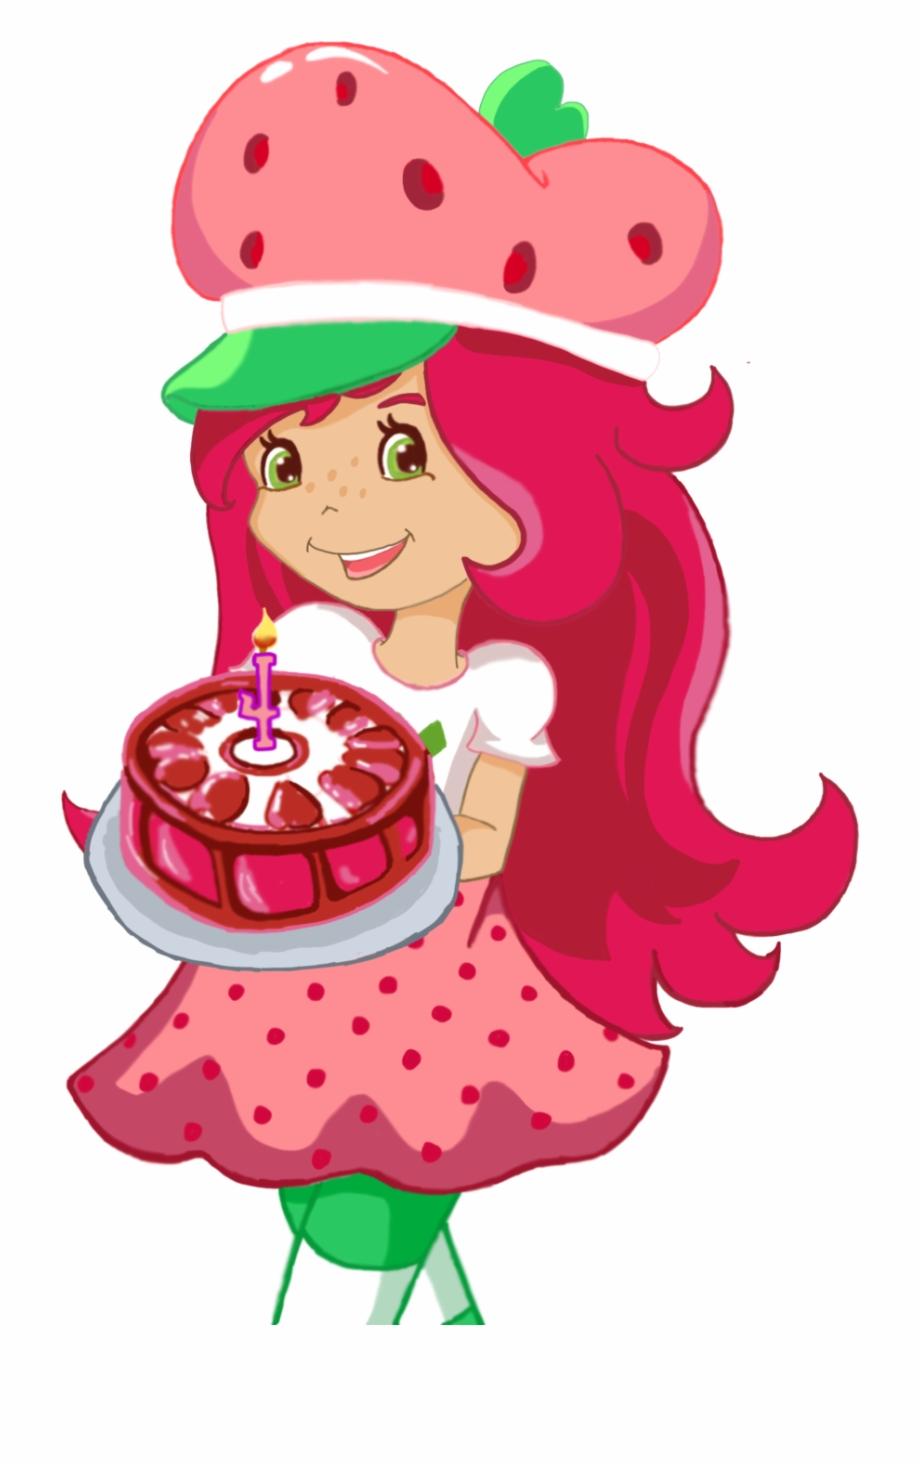 Free clipart strawberry shortcake jpg freeuse Strawberry Shortcake Recipes Hubs Clip Art - Strawberry Shortcake ... jpg freeuse